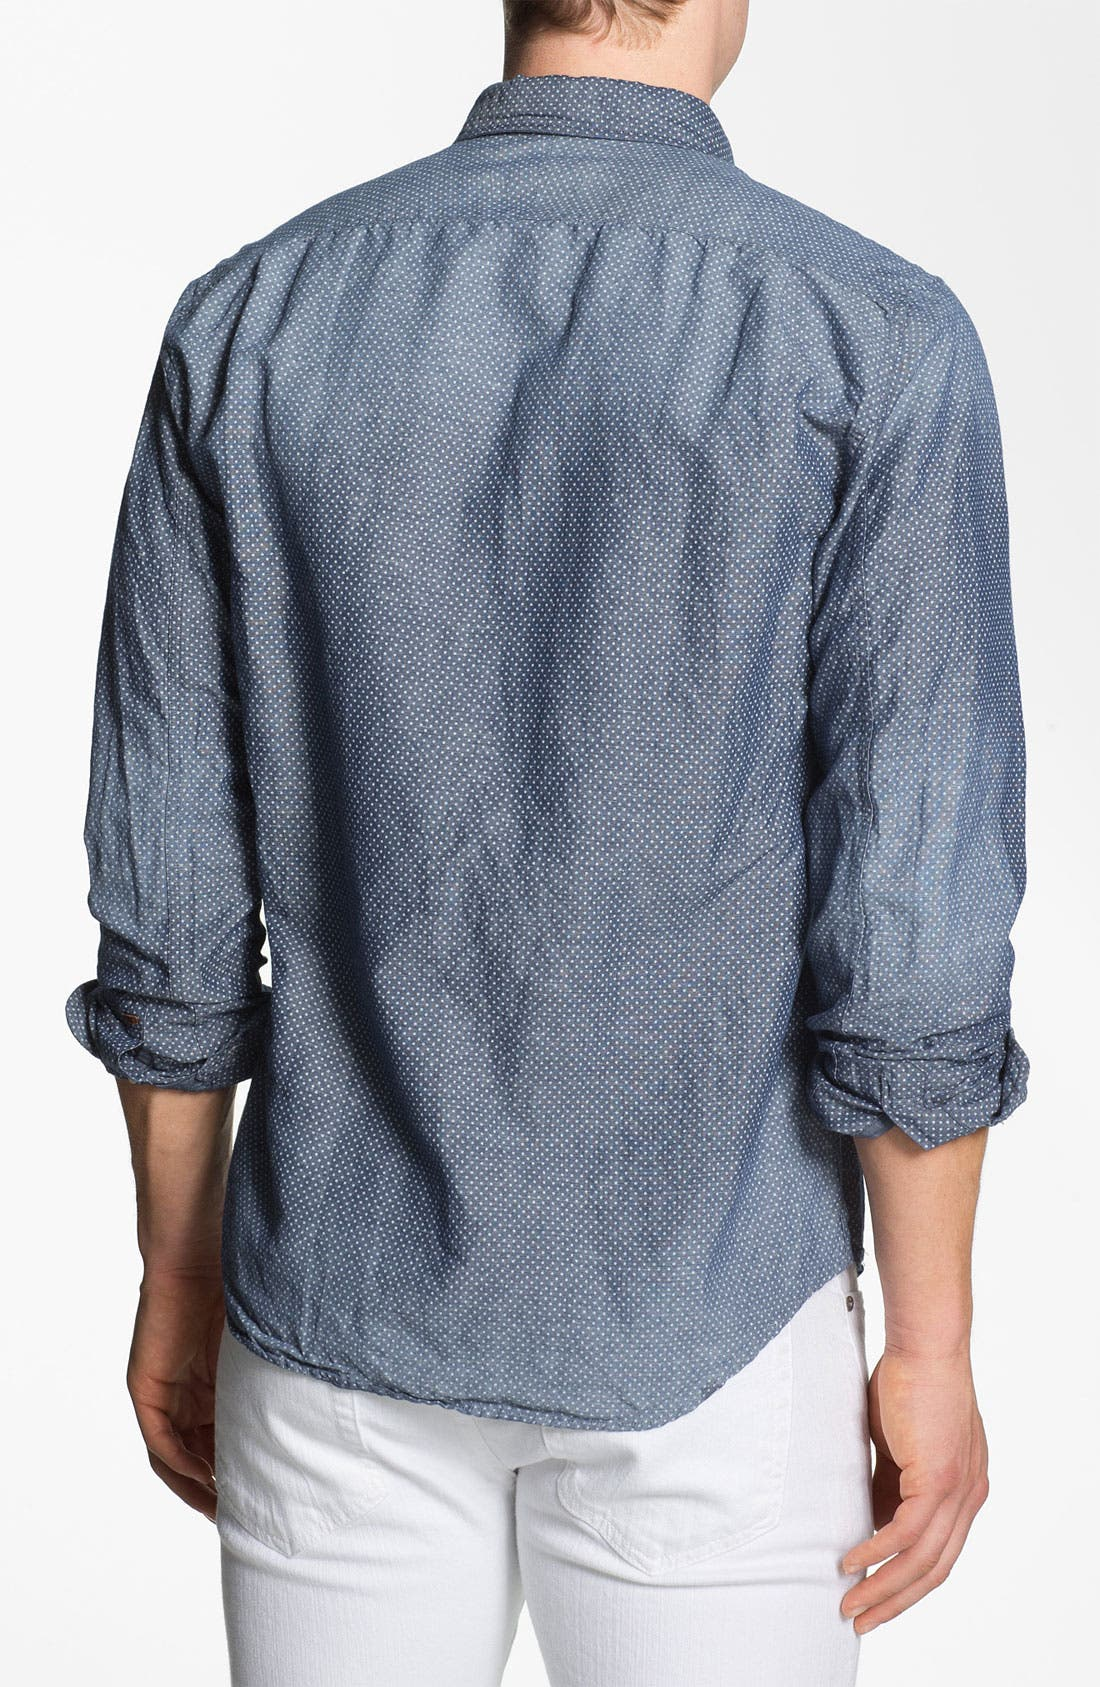 Alternate Image 2  - Scotch & Soda Trim Fit Chambray Shirt